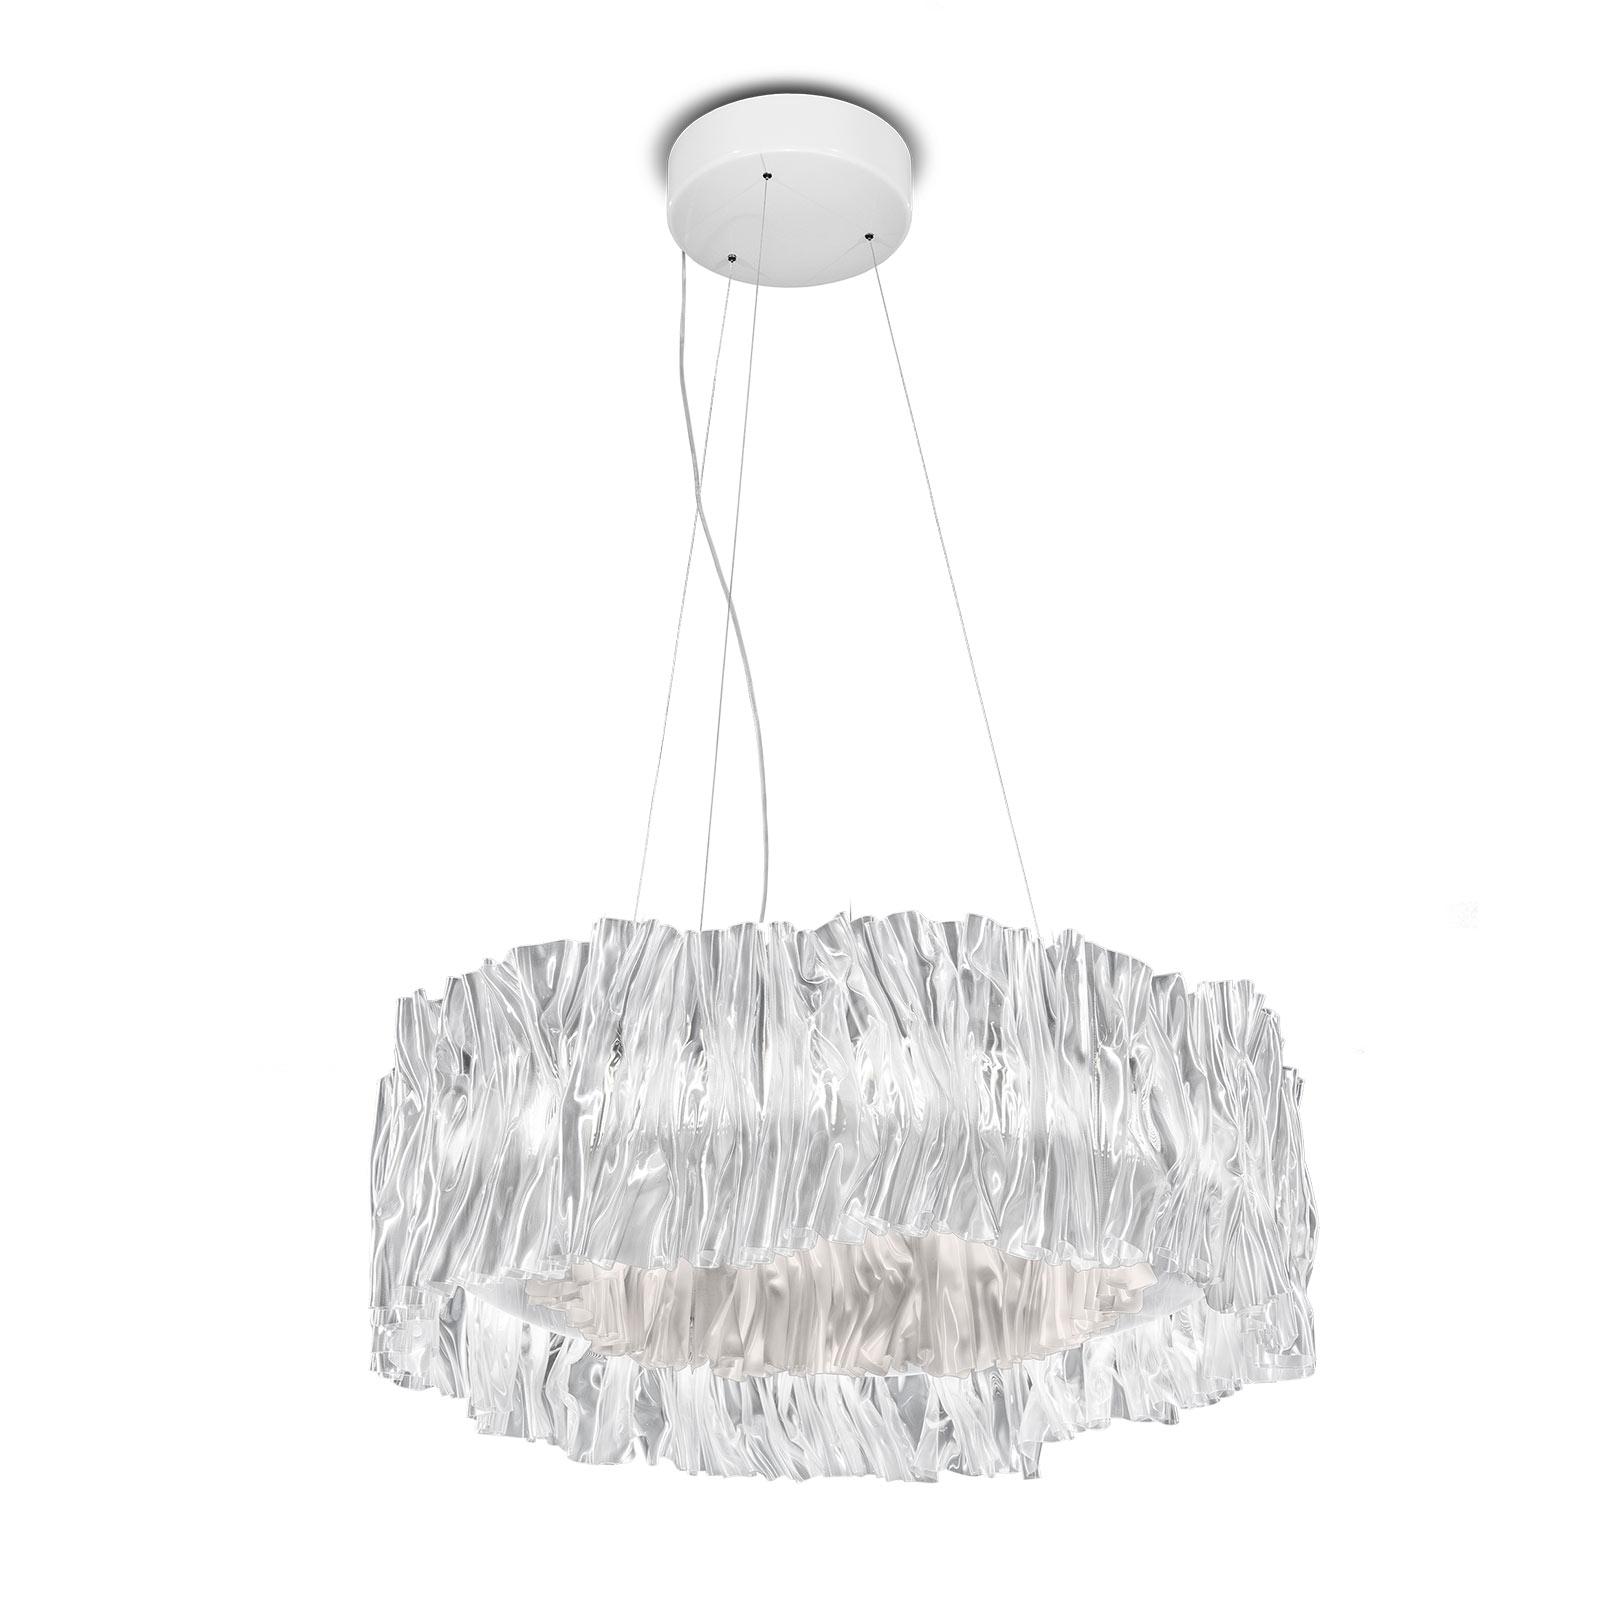 Slamp Accordéon LED-hengelampe hvit 2700K